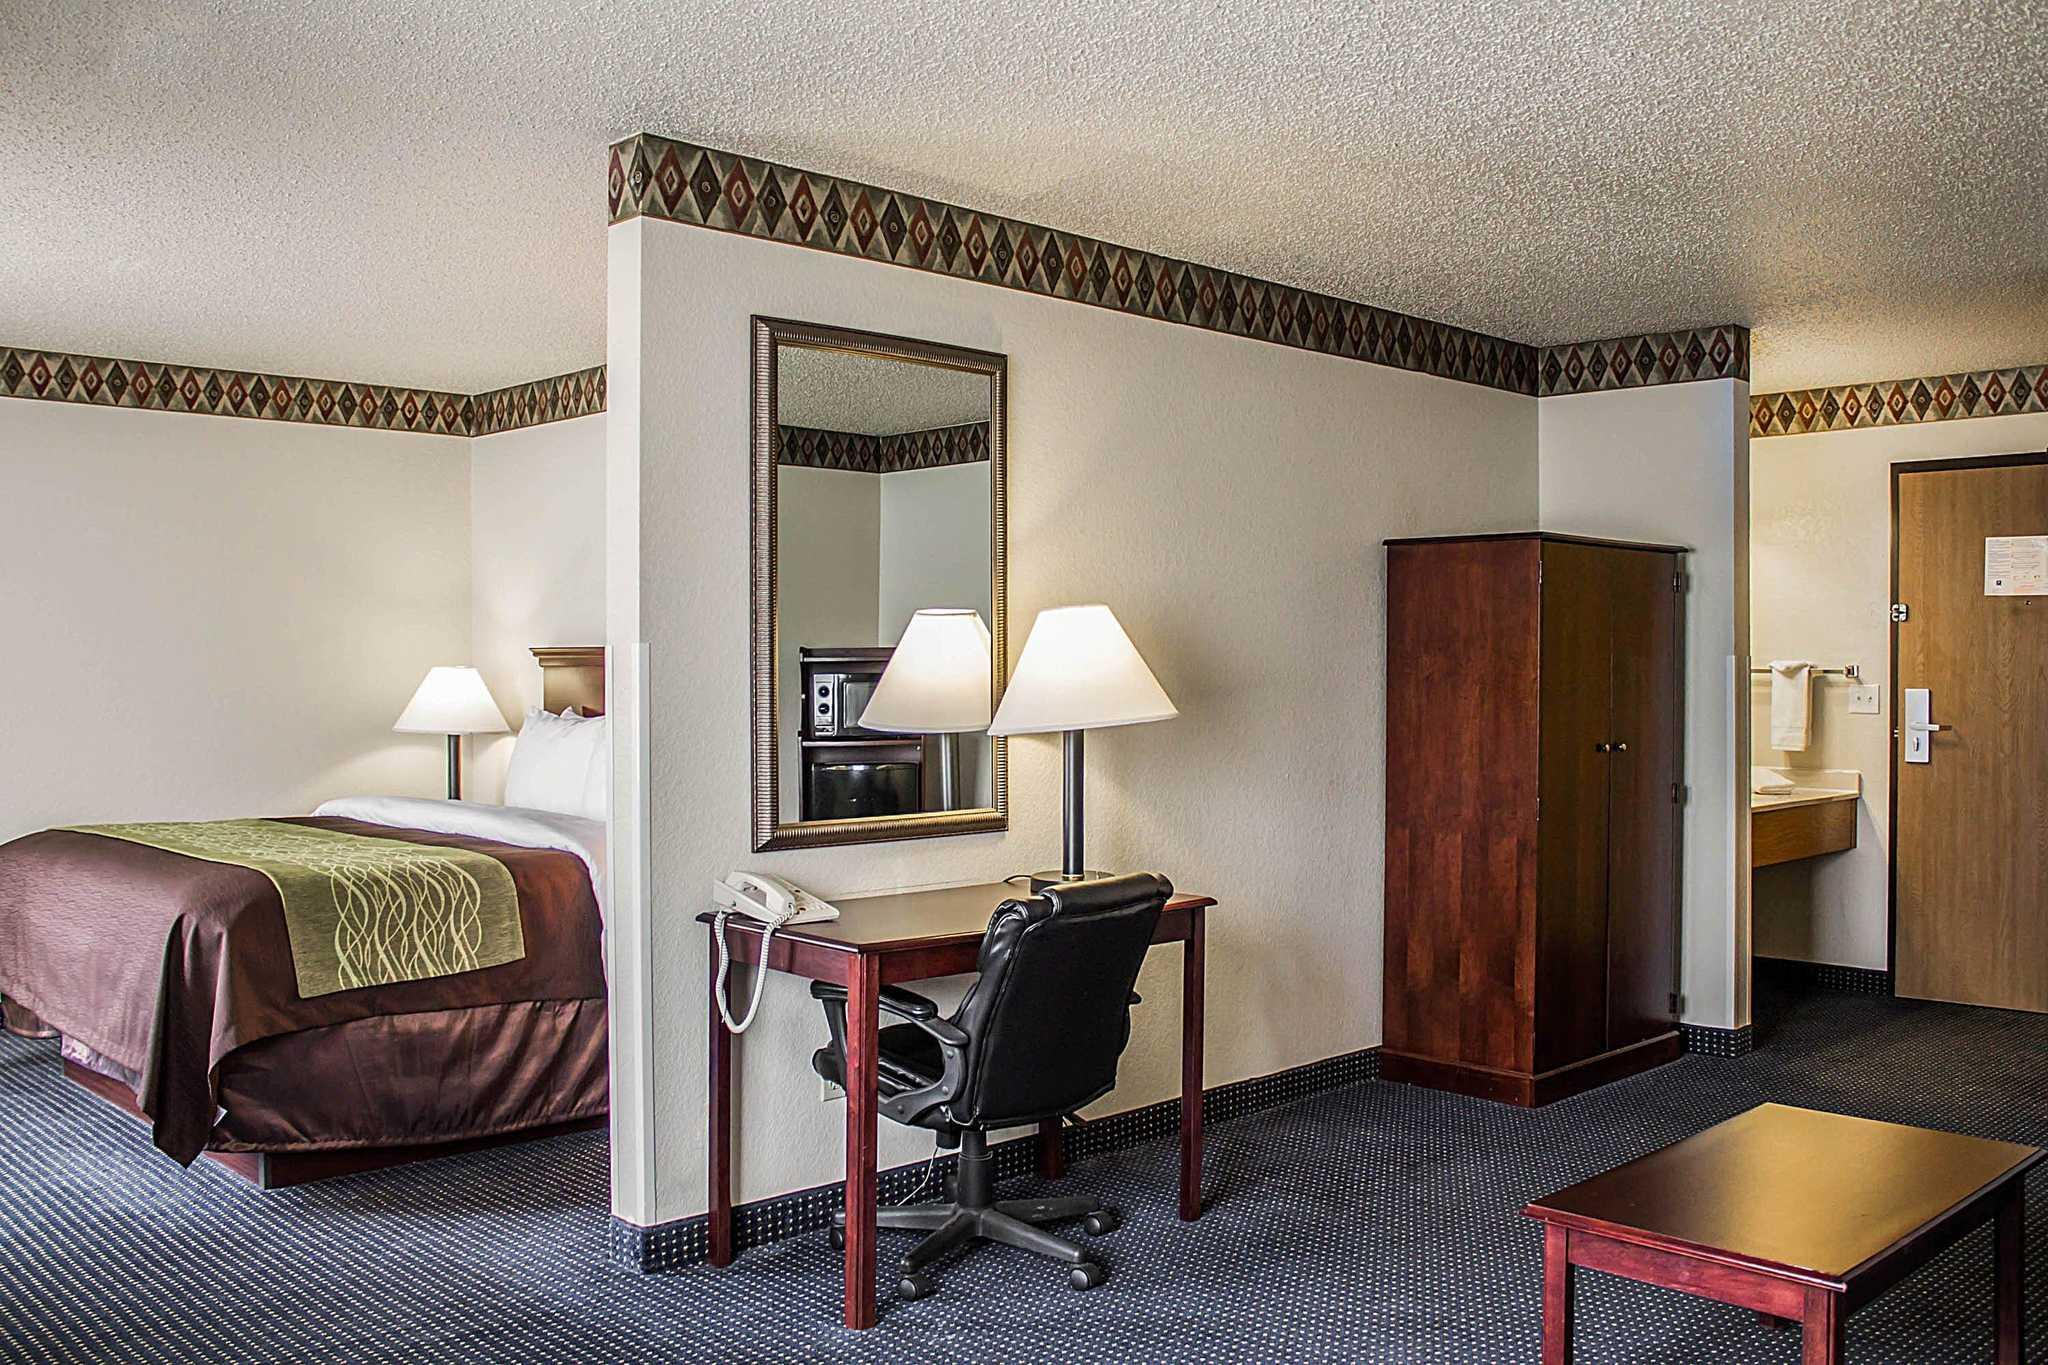 Quality Inn & Suites image 23